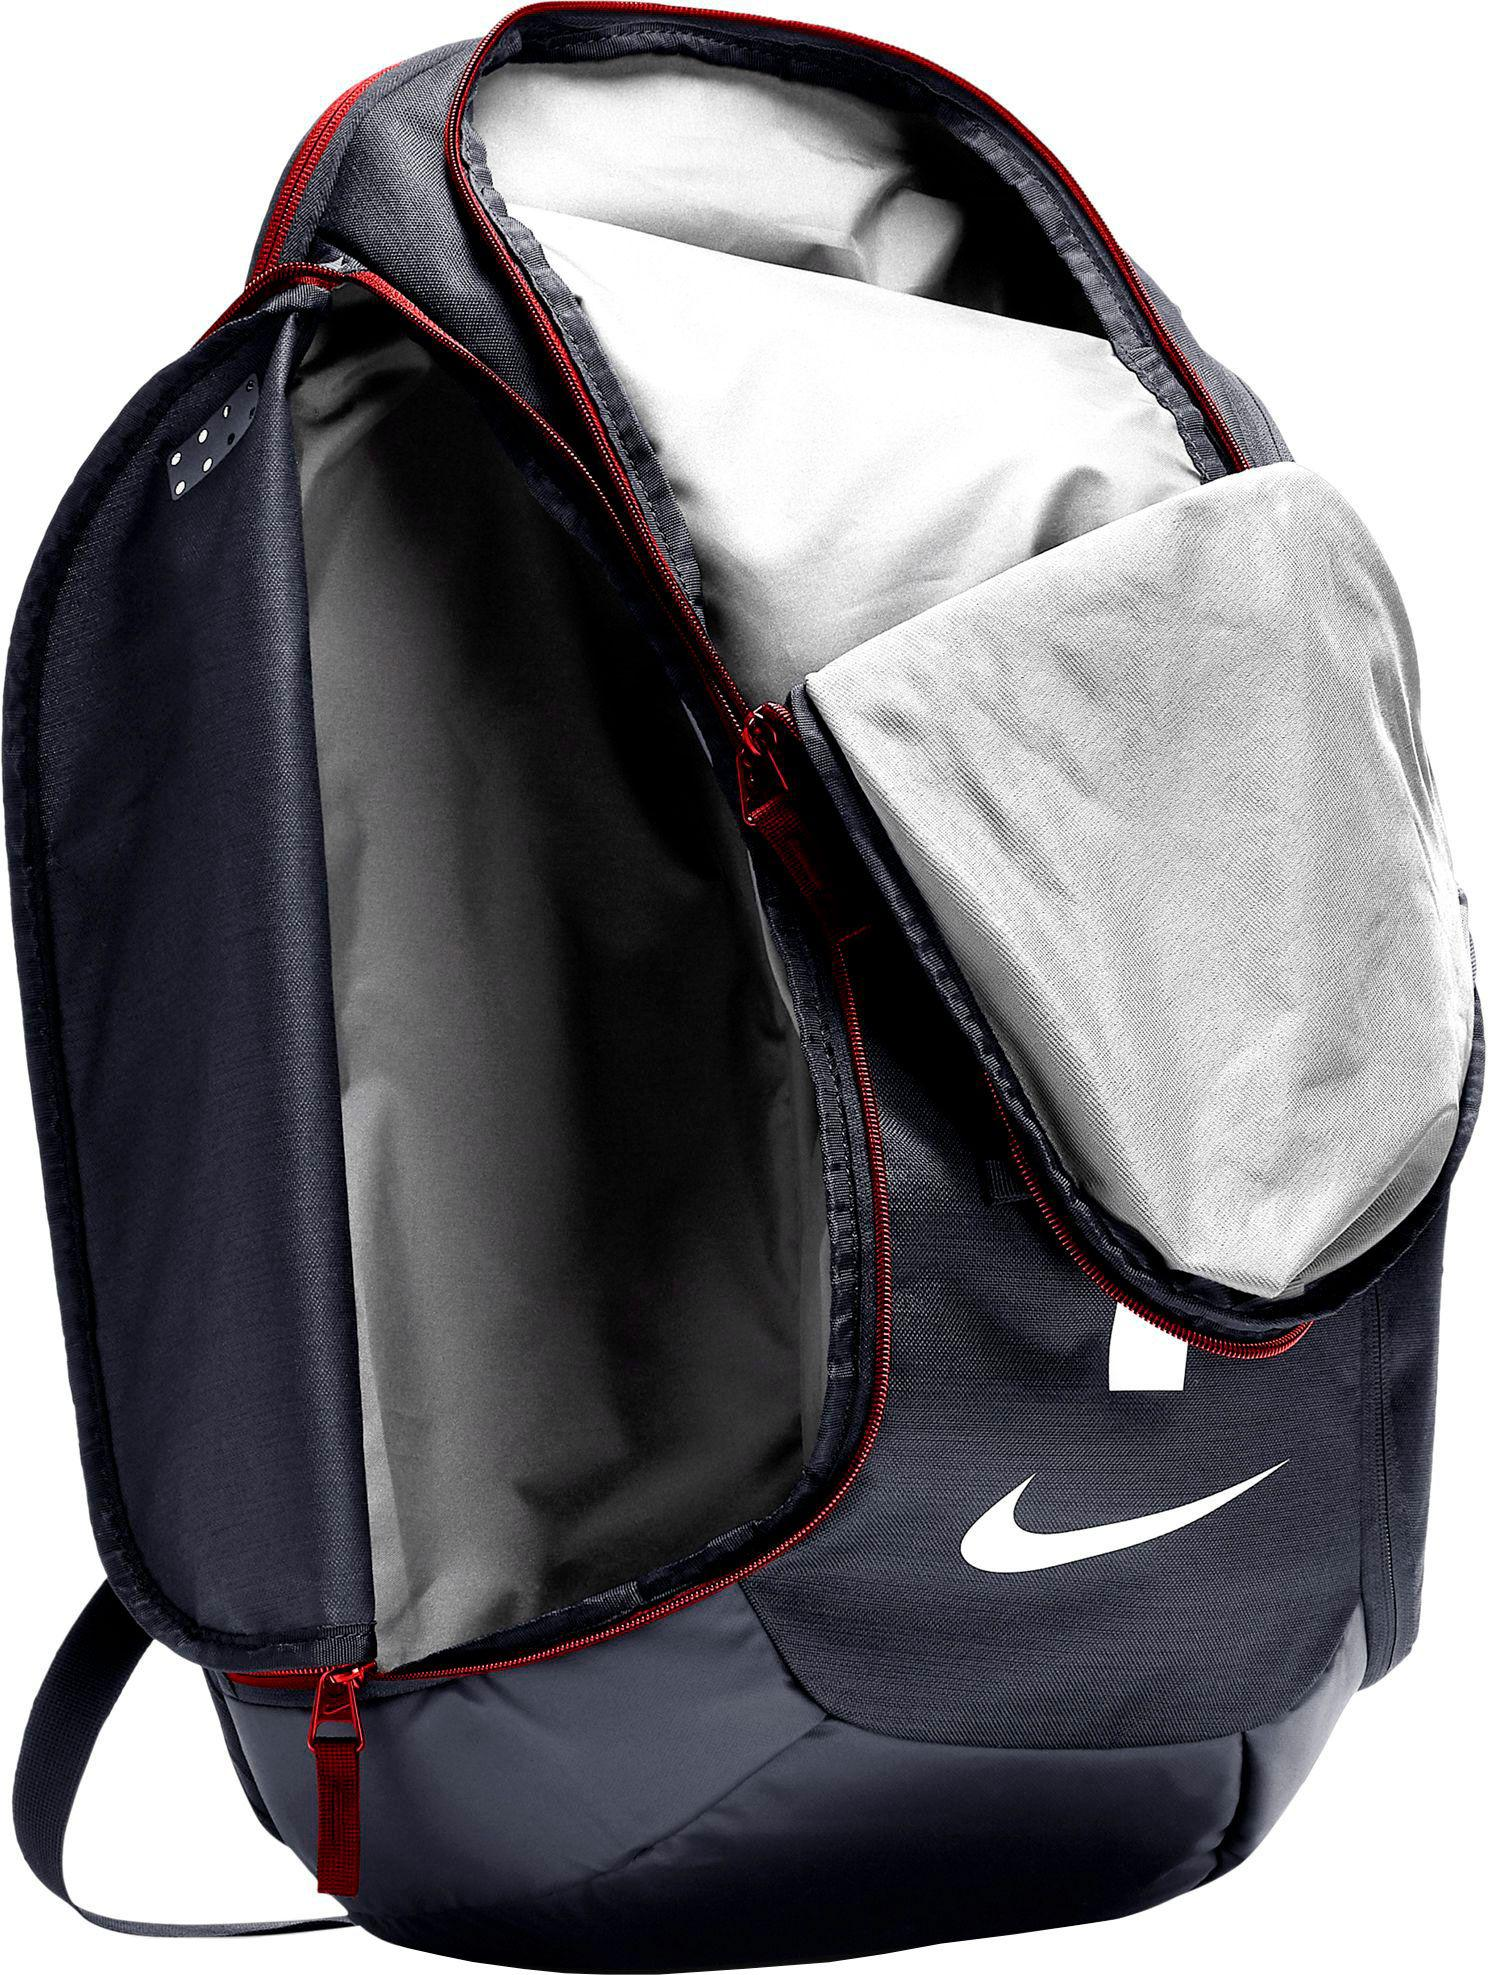 Lyst - Nike Hoops Elite Pro Basketball Backpack in Blue for Men 7bb47e3dac3eb